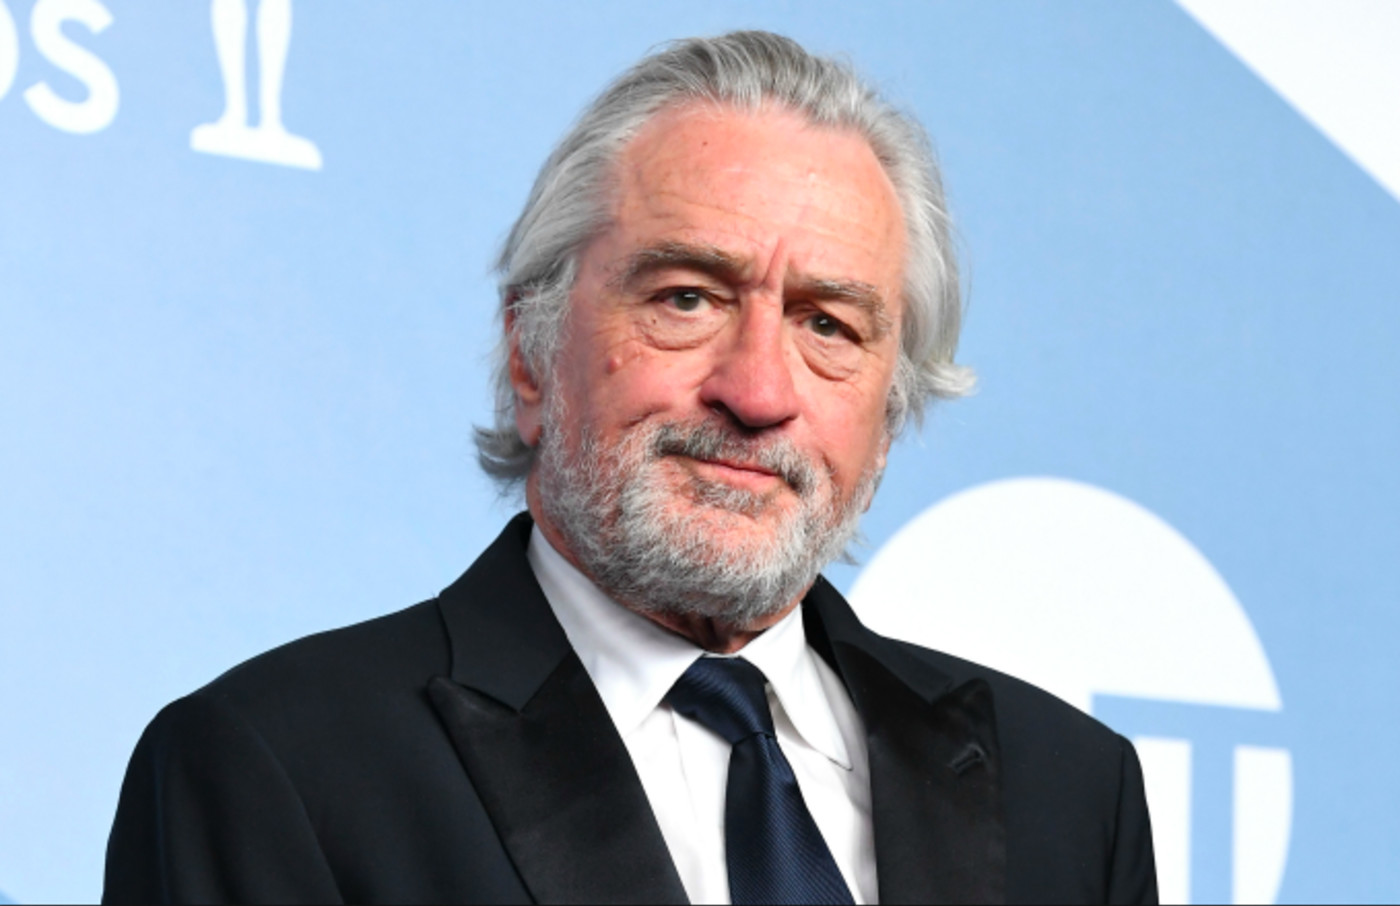 Robert De Niro poses at the 26th Annual Screen ActorsGuild Awards